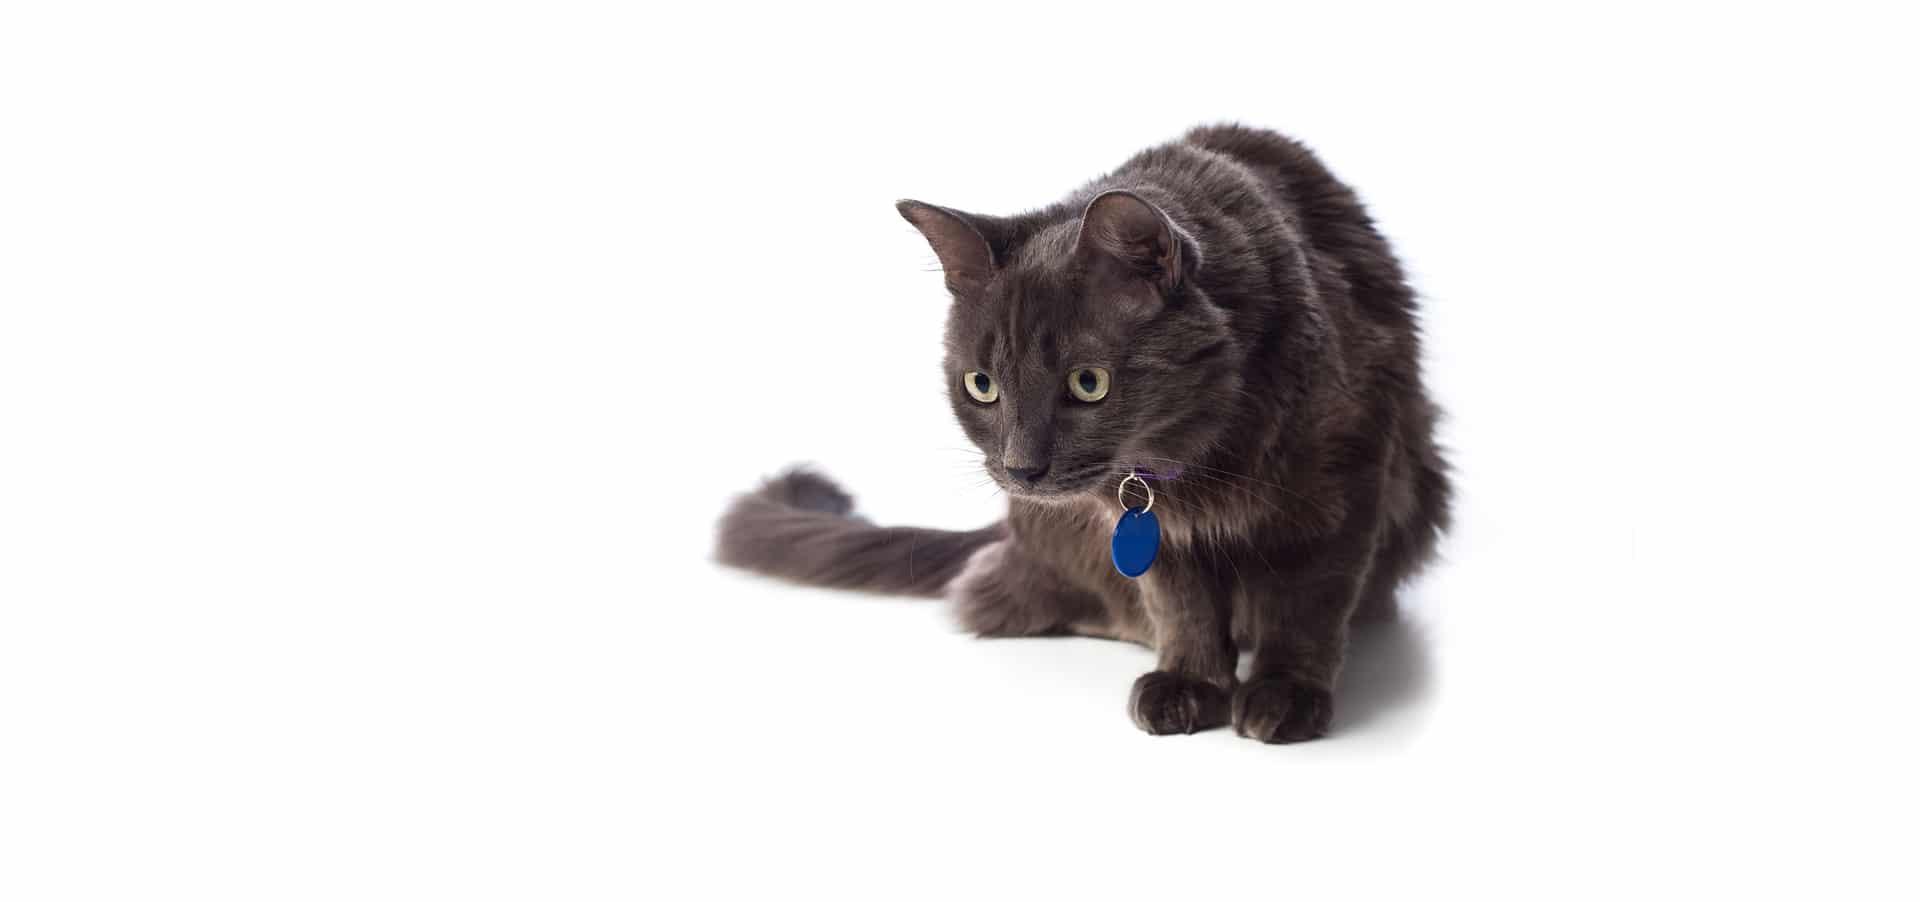 Nebelung-Cat